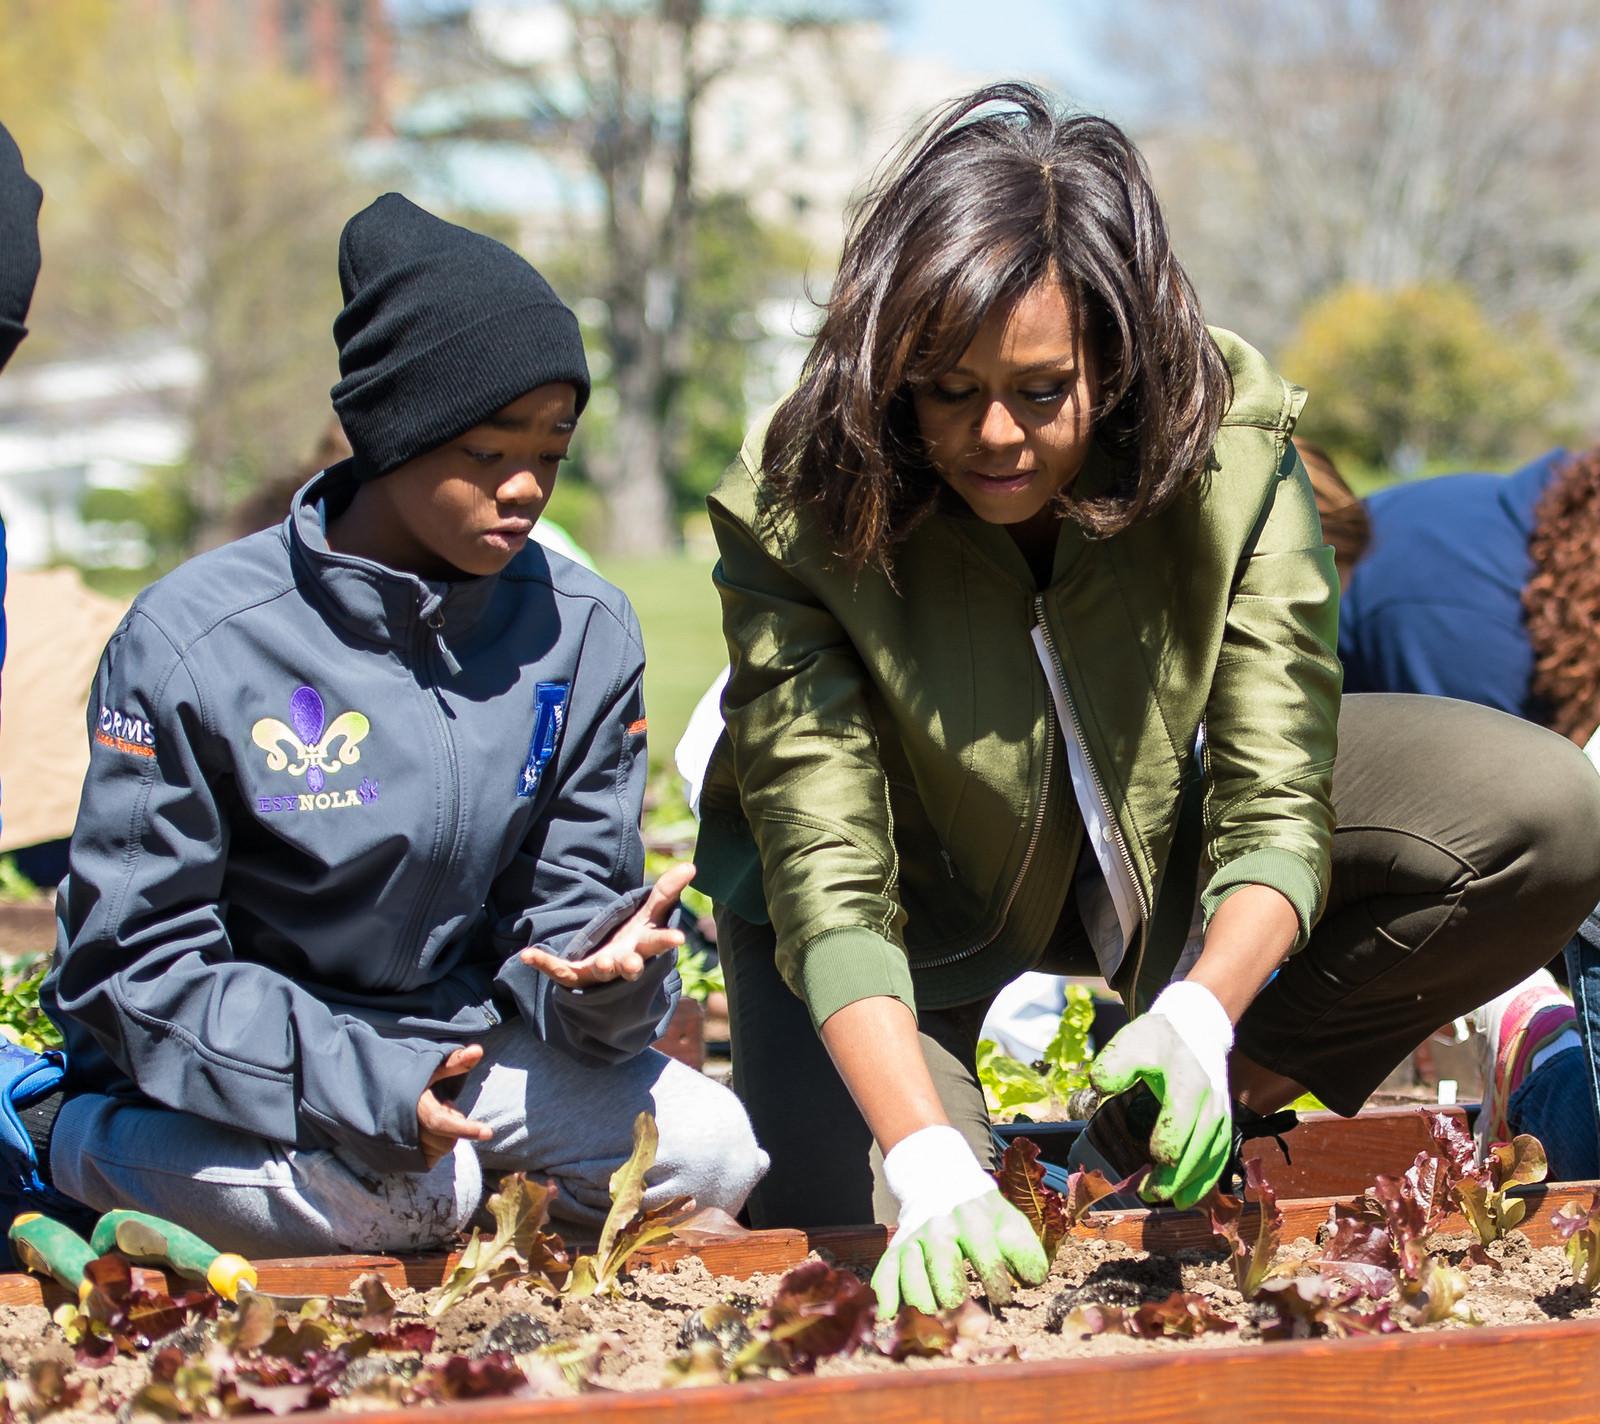 First Lady Michelle Obama planted the White House Kitchen Garden,propelling the school garden movement. - Thanks to NASA/Aubrey Gemignani.